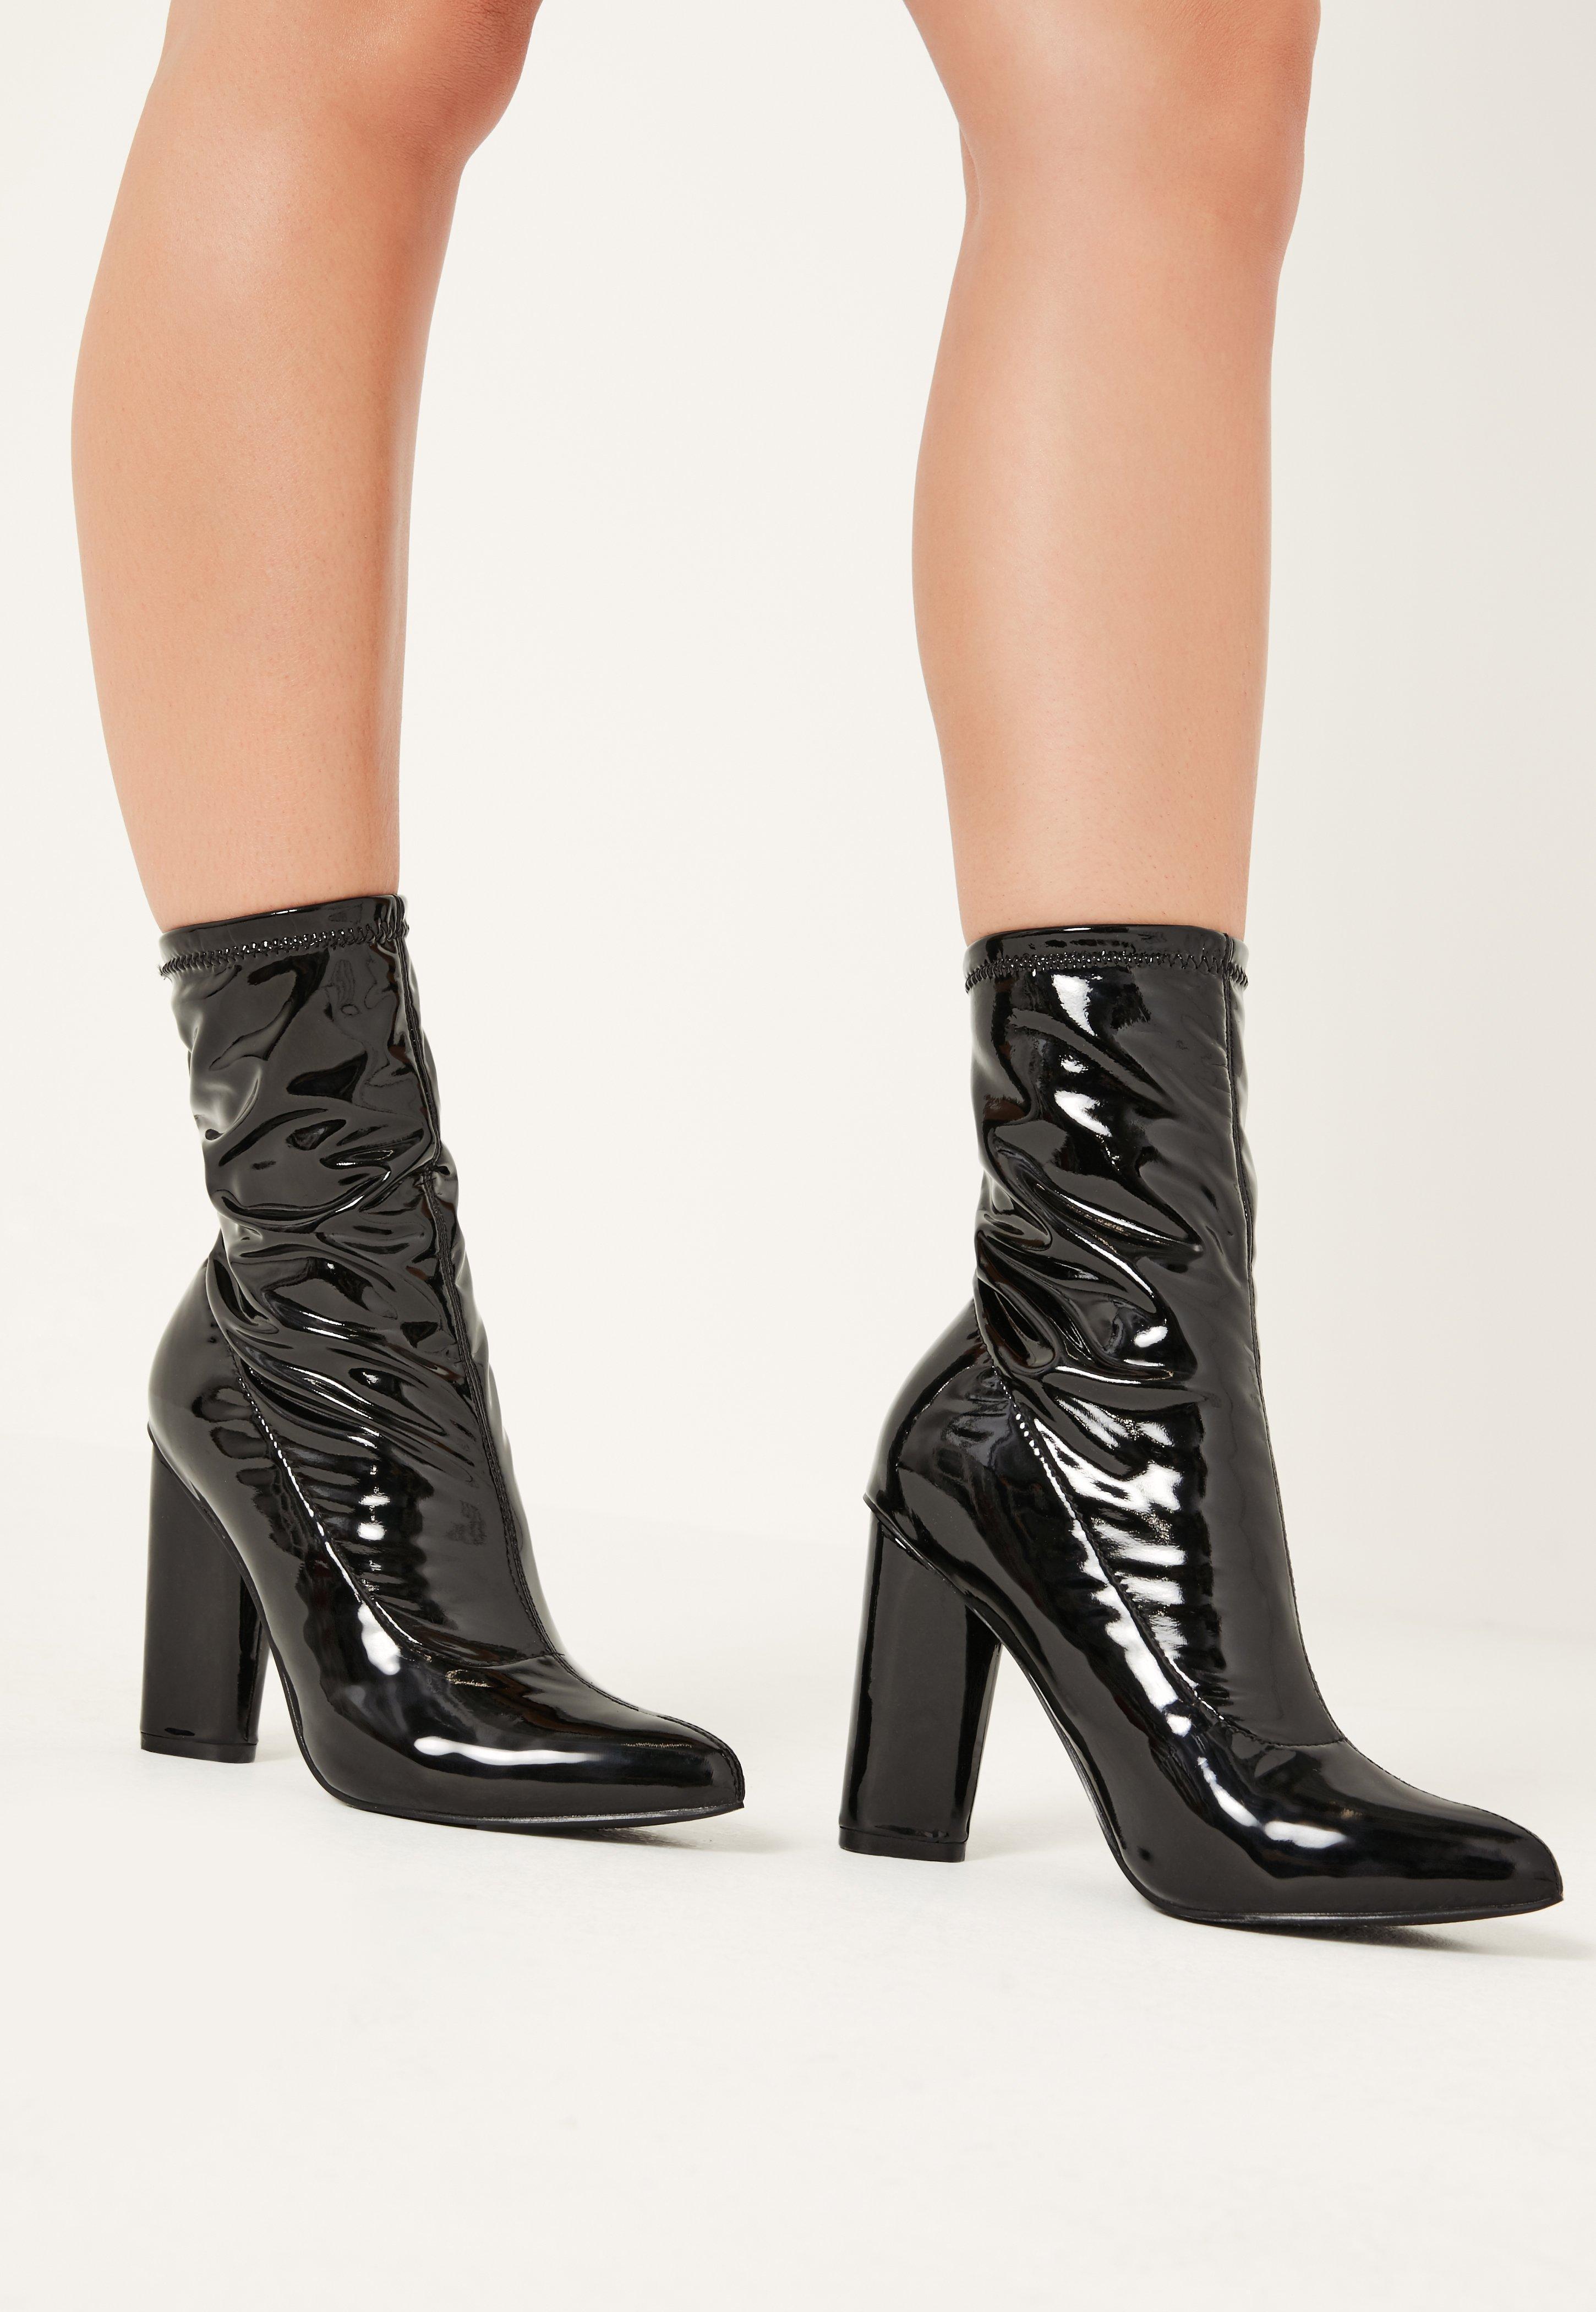 Missguided Black Patent Mid Calf Sock